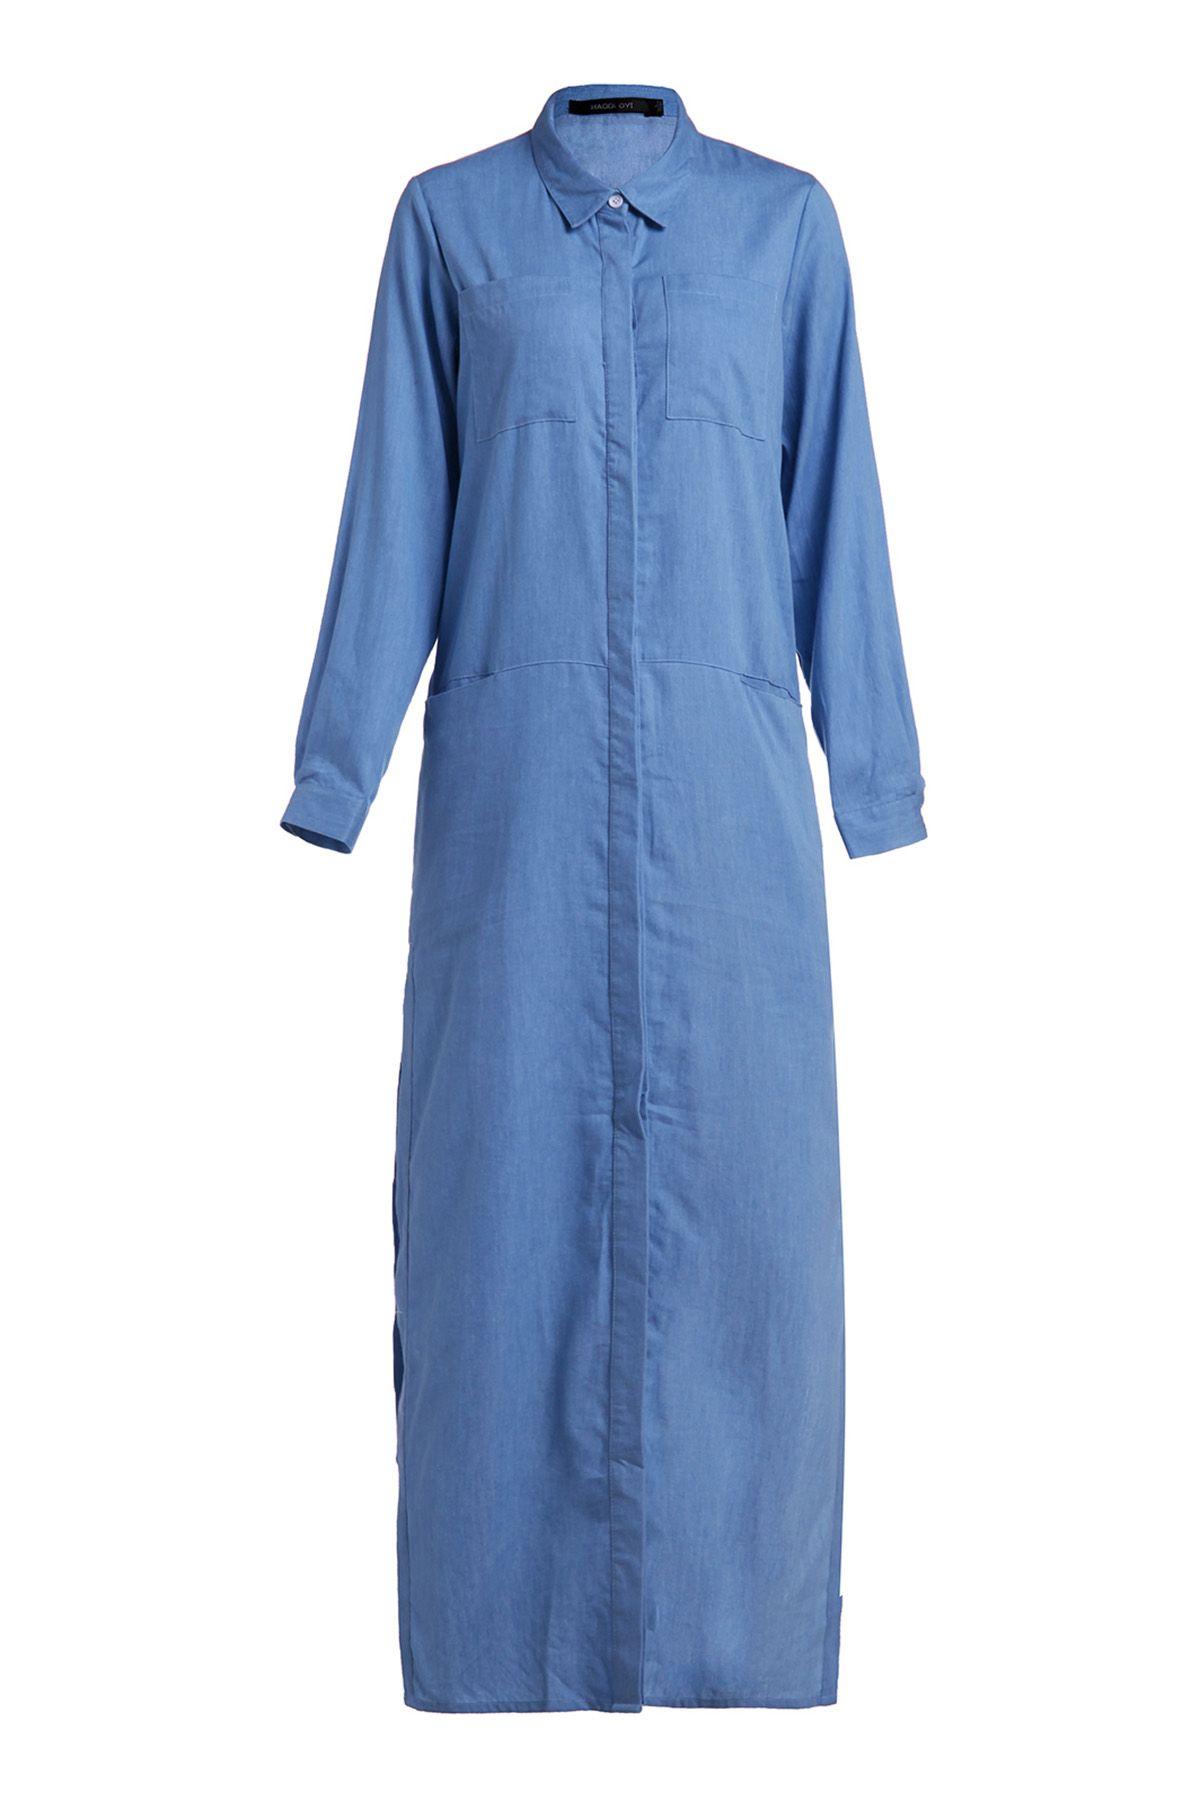 Denim long sleeve maxi shirt dress long sleeve maxi blue denim